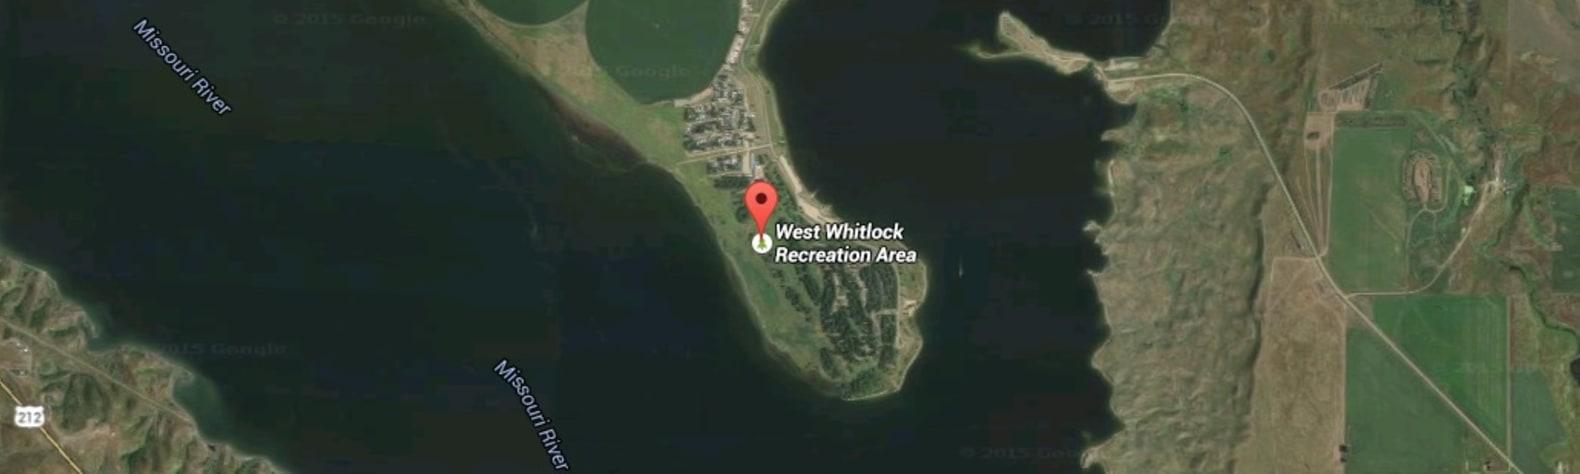 West Whitlock Recreation Area